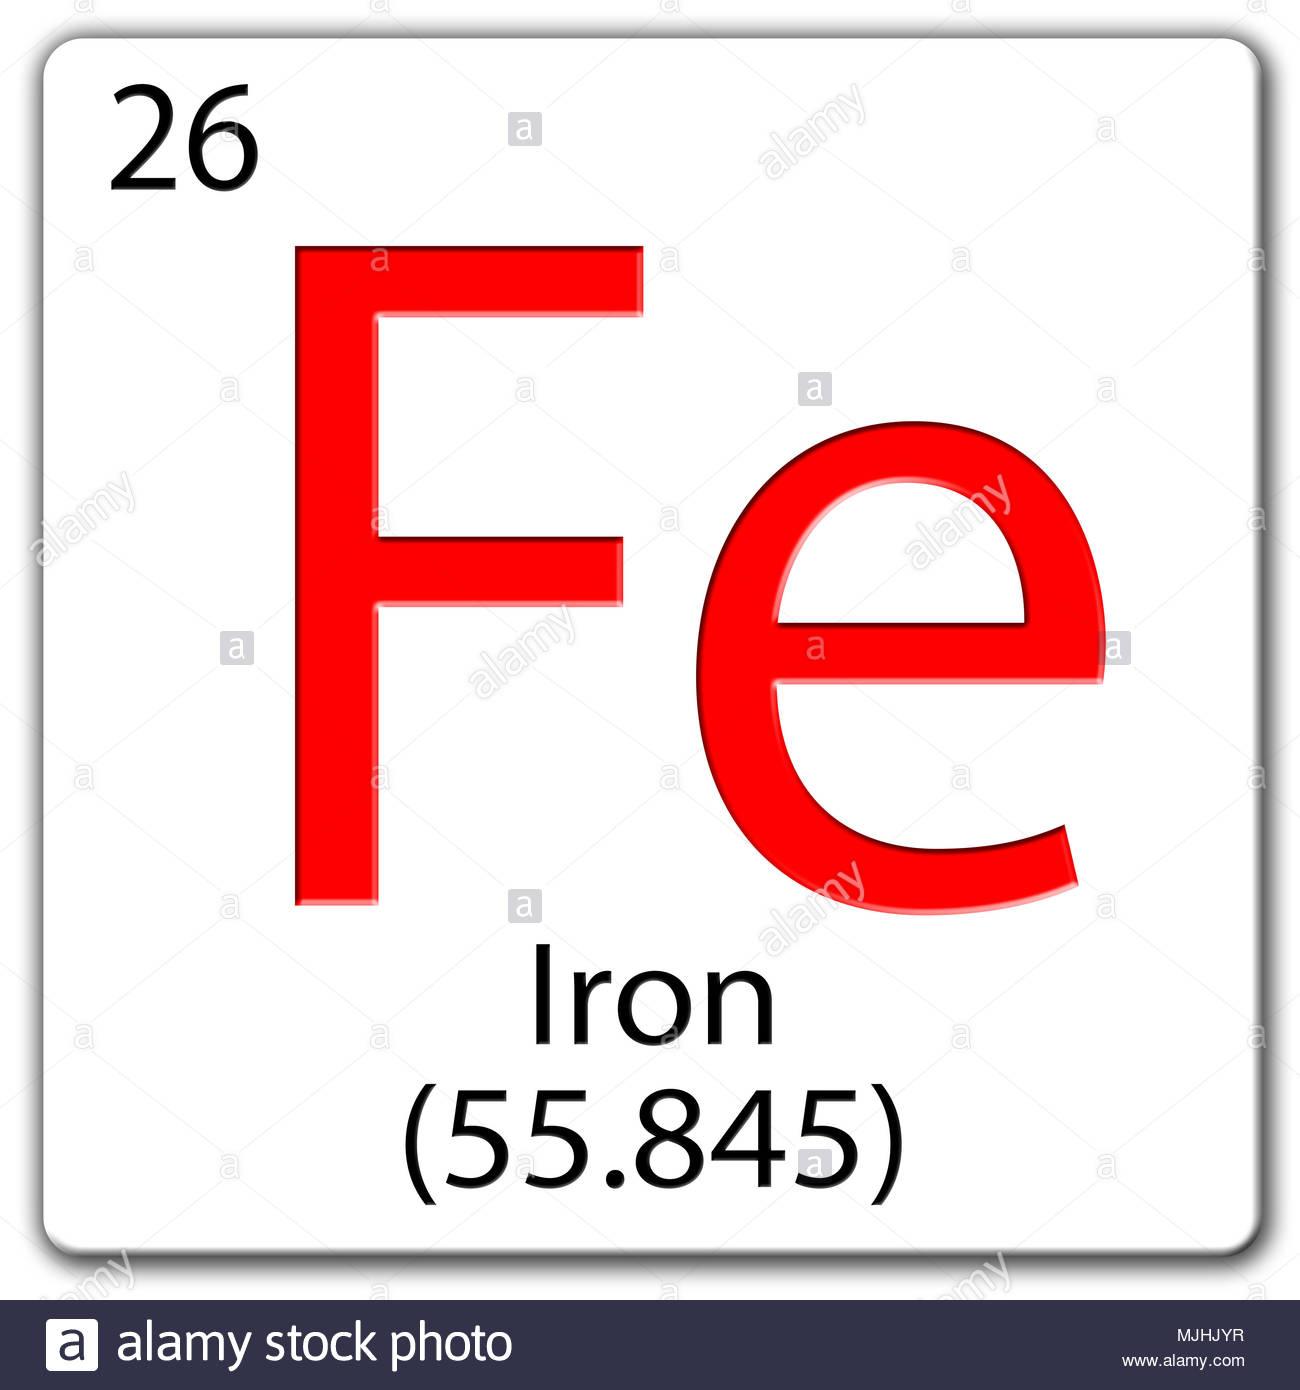 Chemical Element Tile Fe Iron Stock Photo 183555563 Alamy